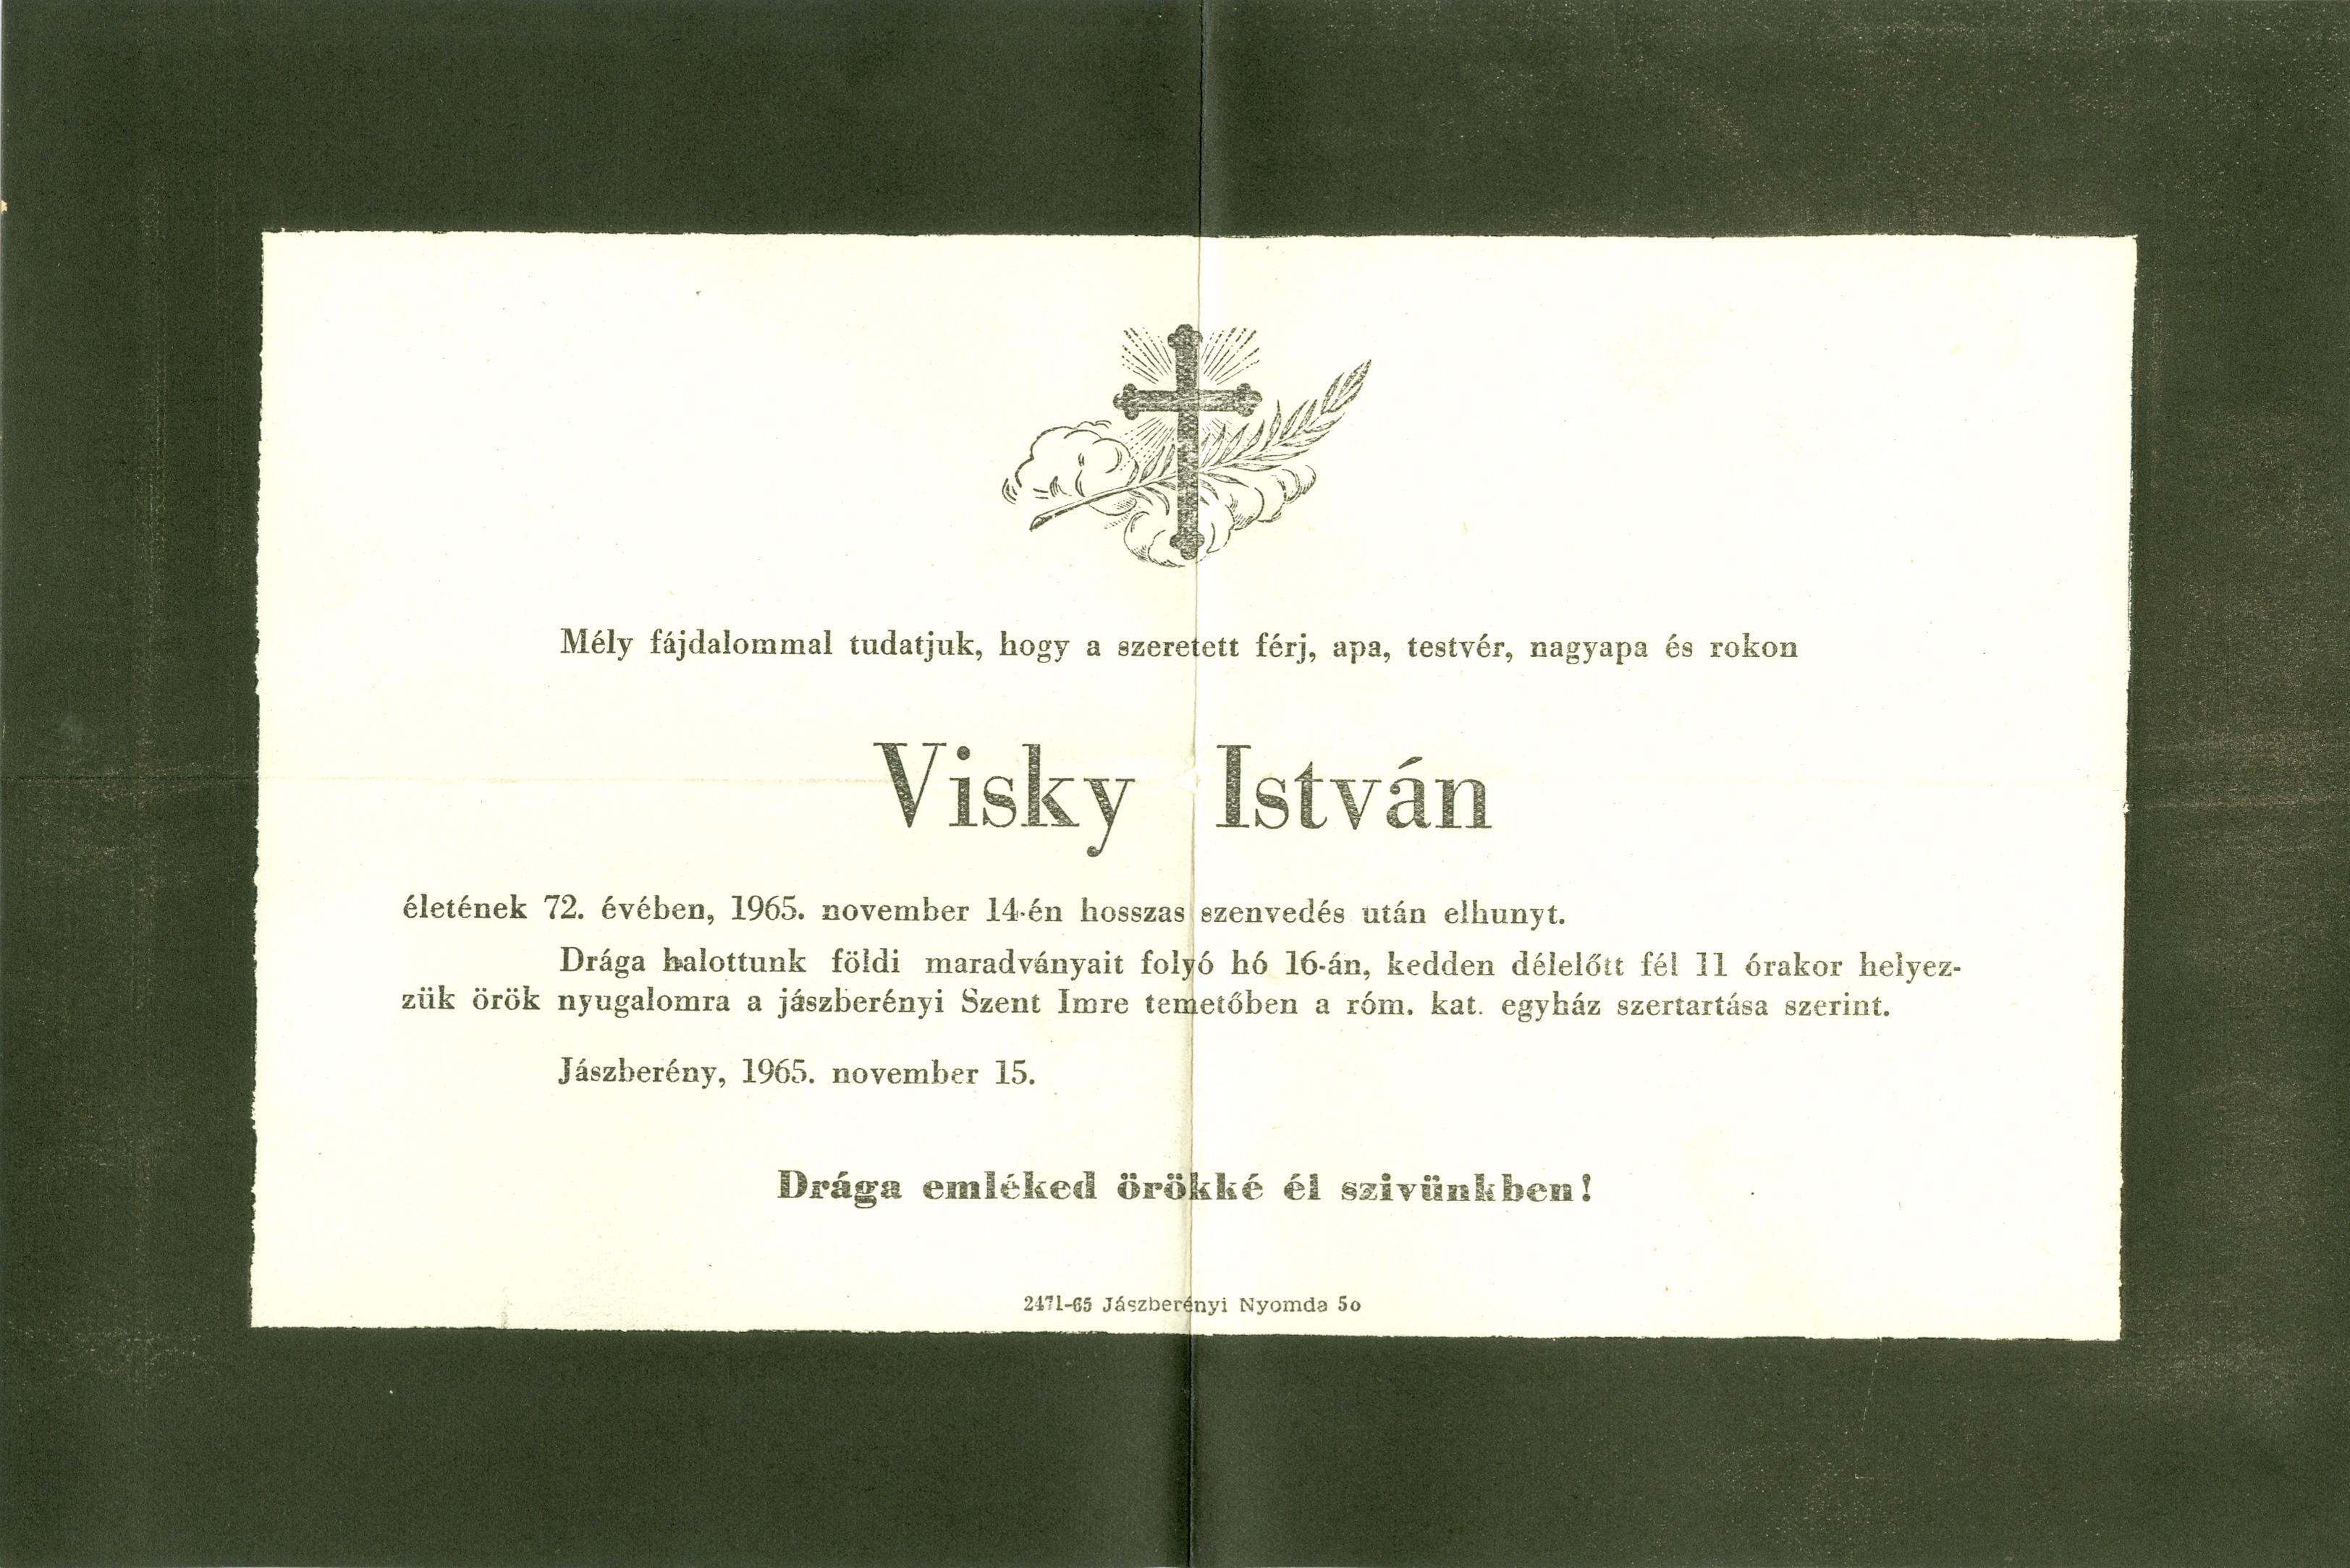 Visky István